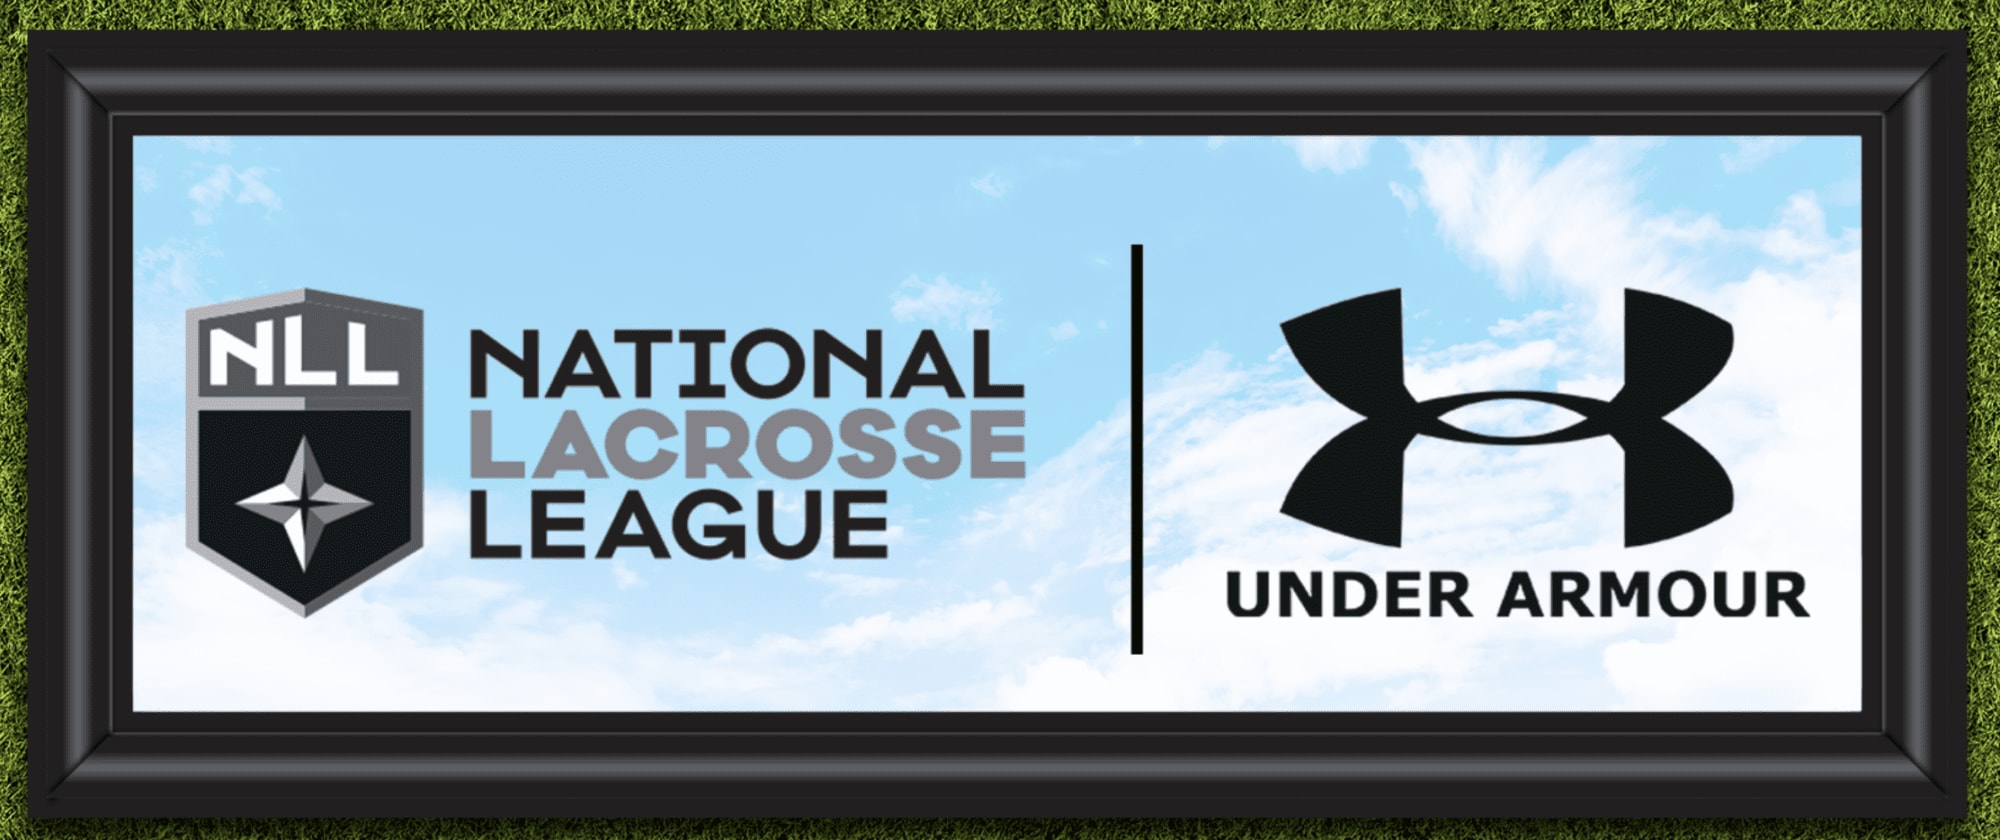 national lacrosse league team 22 under armour nll